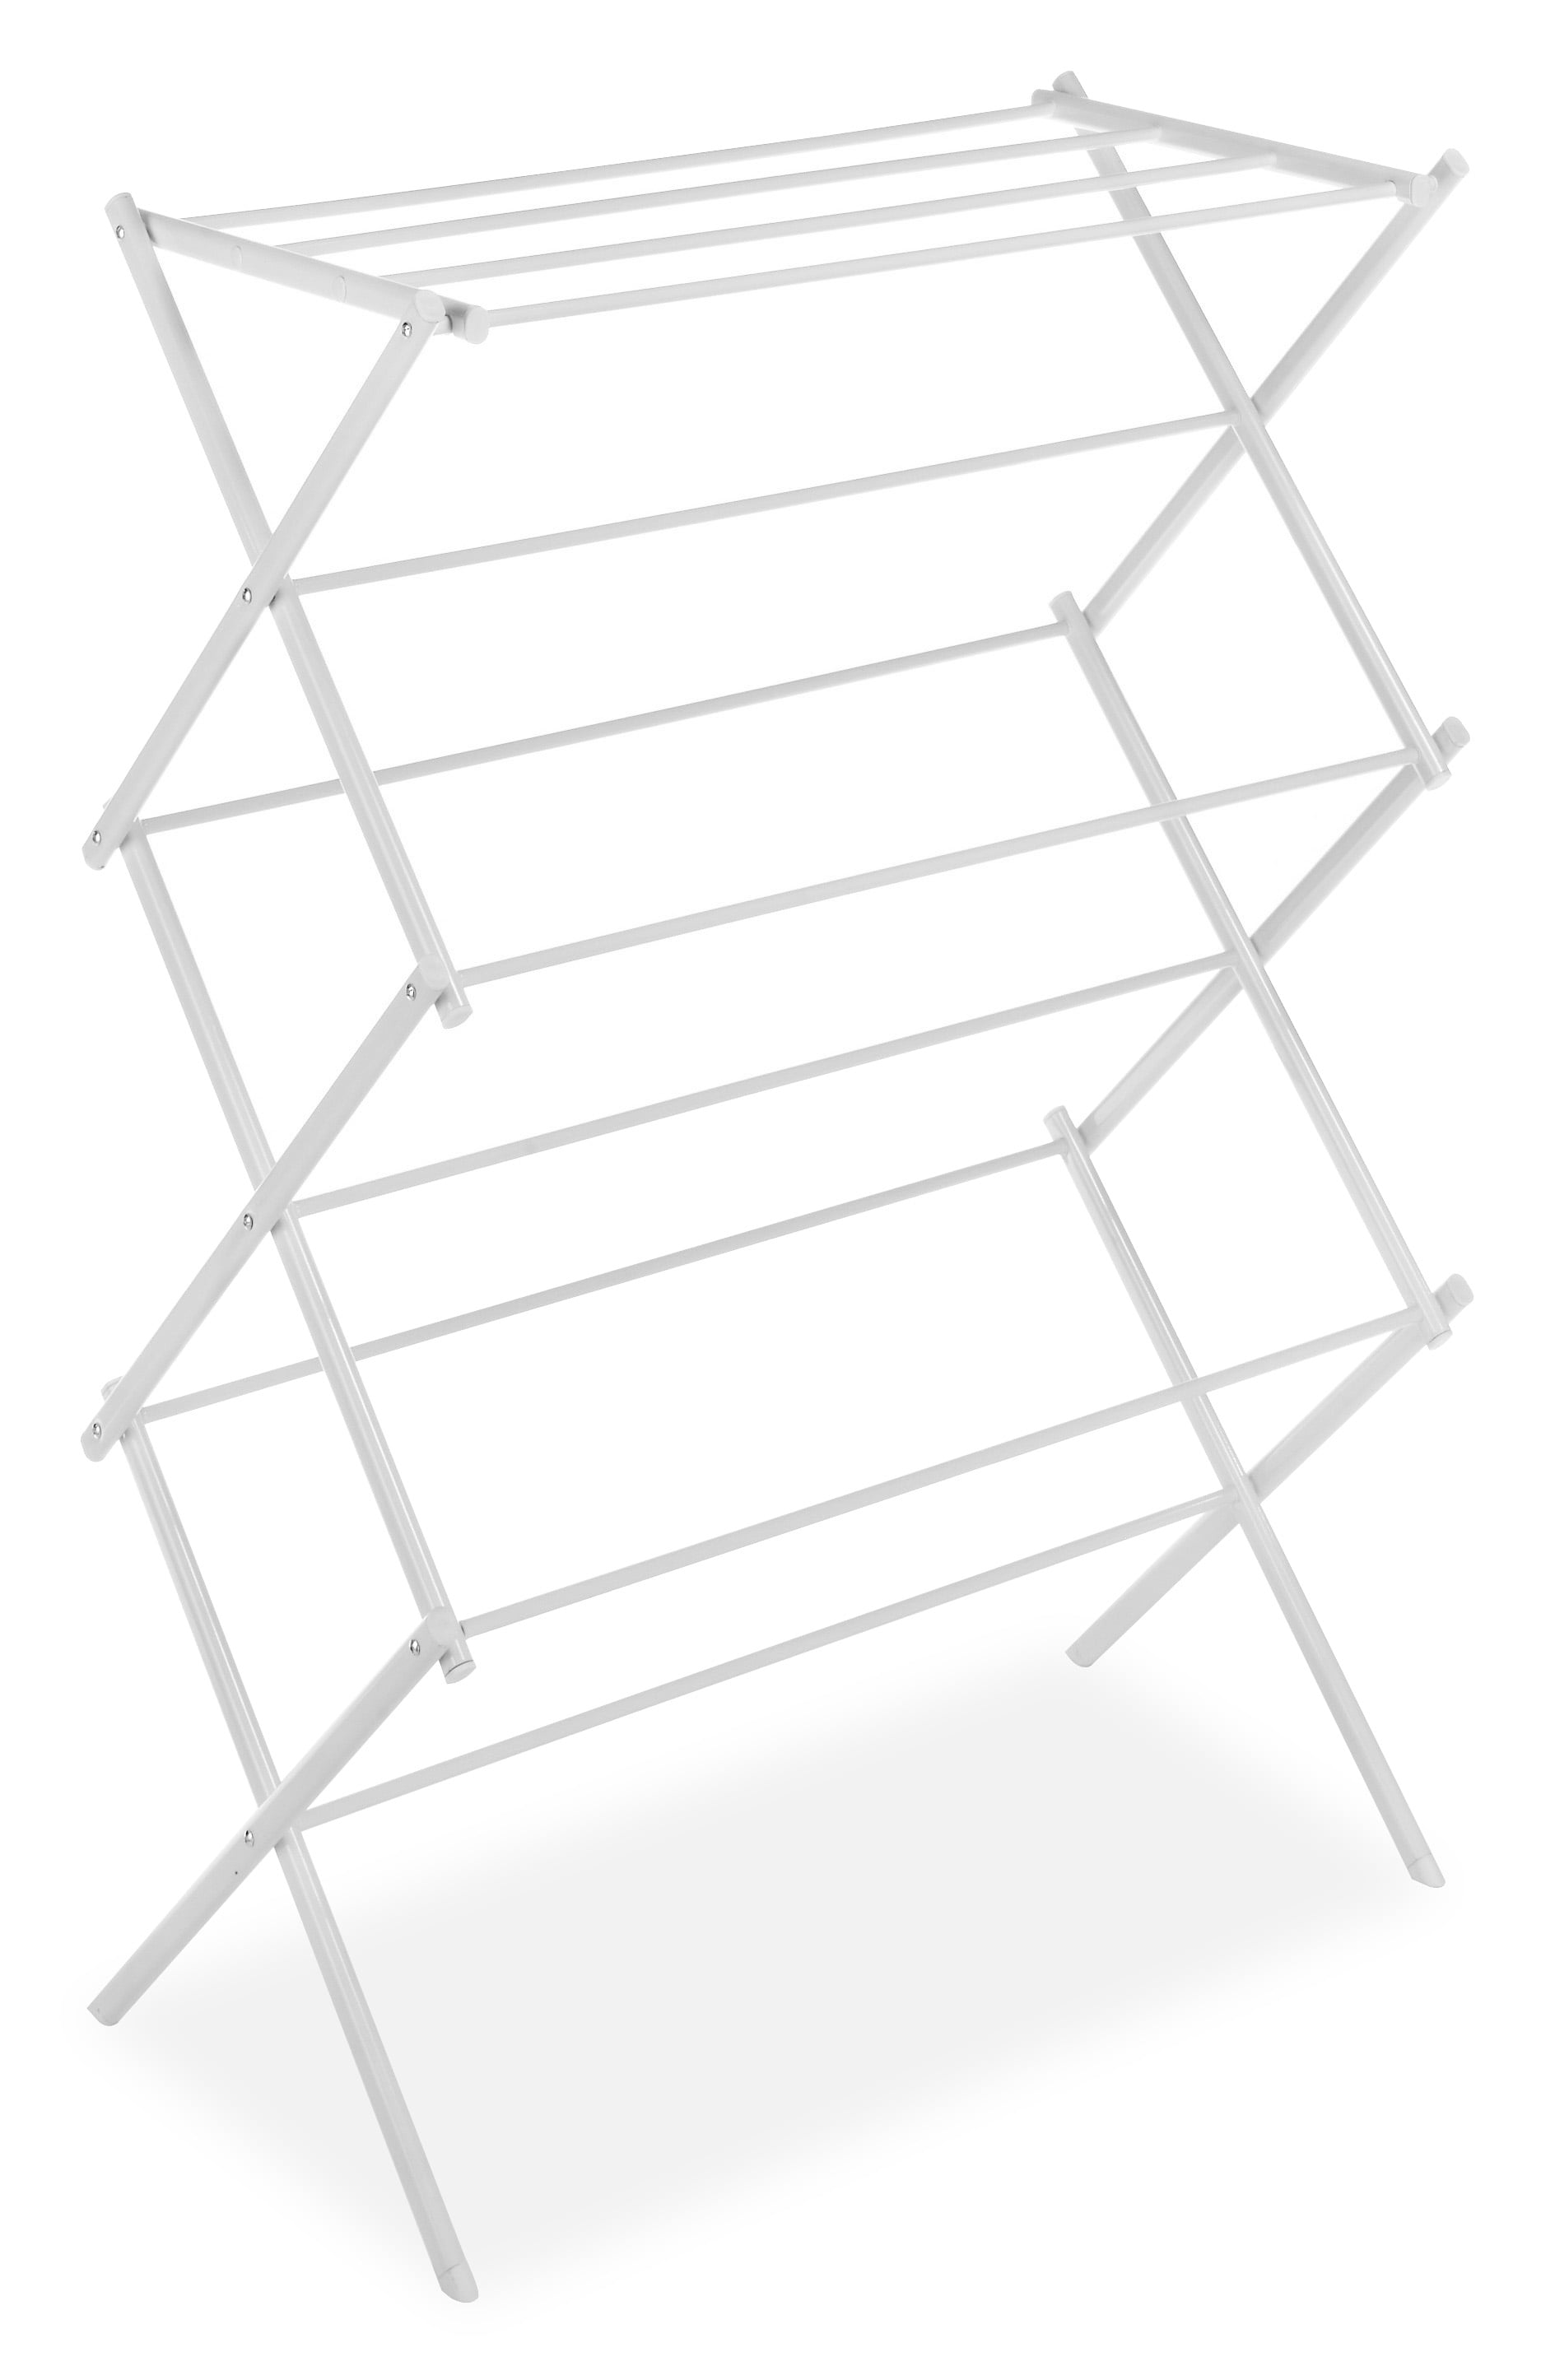 Whitmor 3 Tier Folding Drying Rack White 14 5 X 29 5 X 41 75 Walmart Com Walmart Com